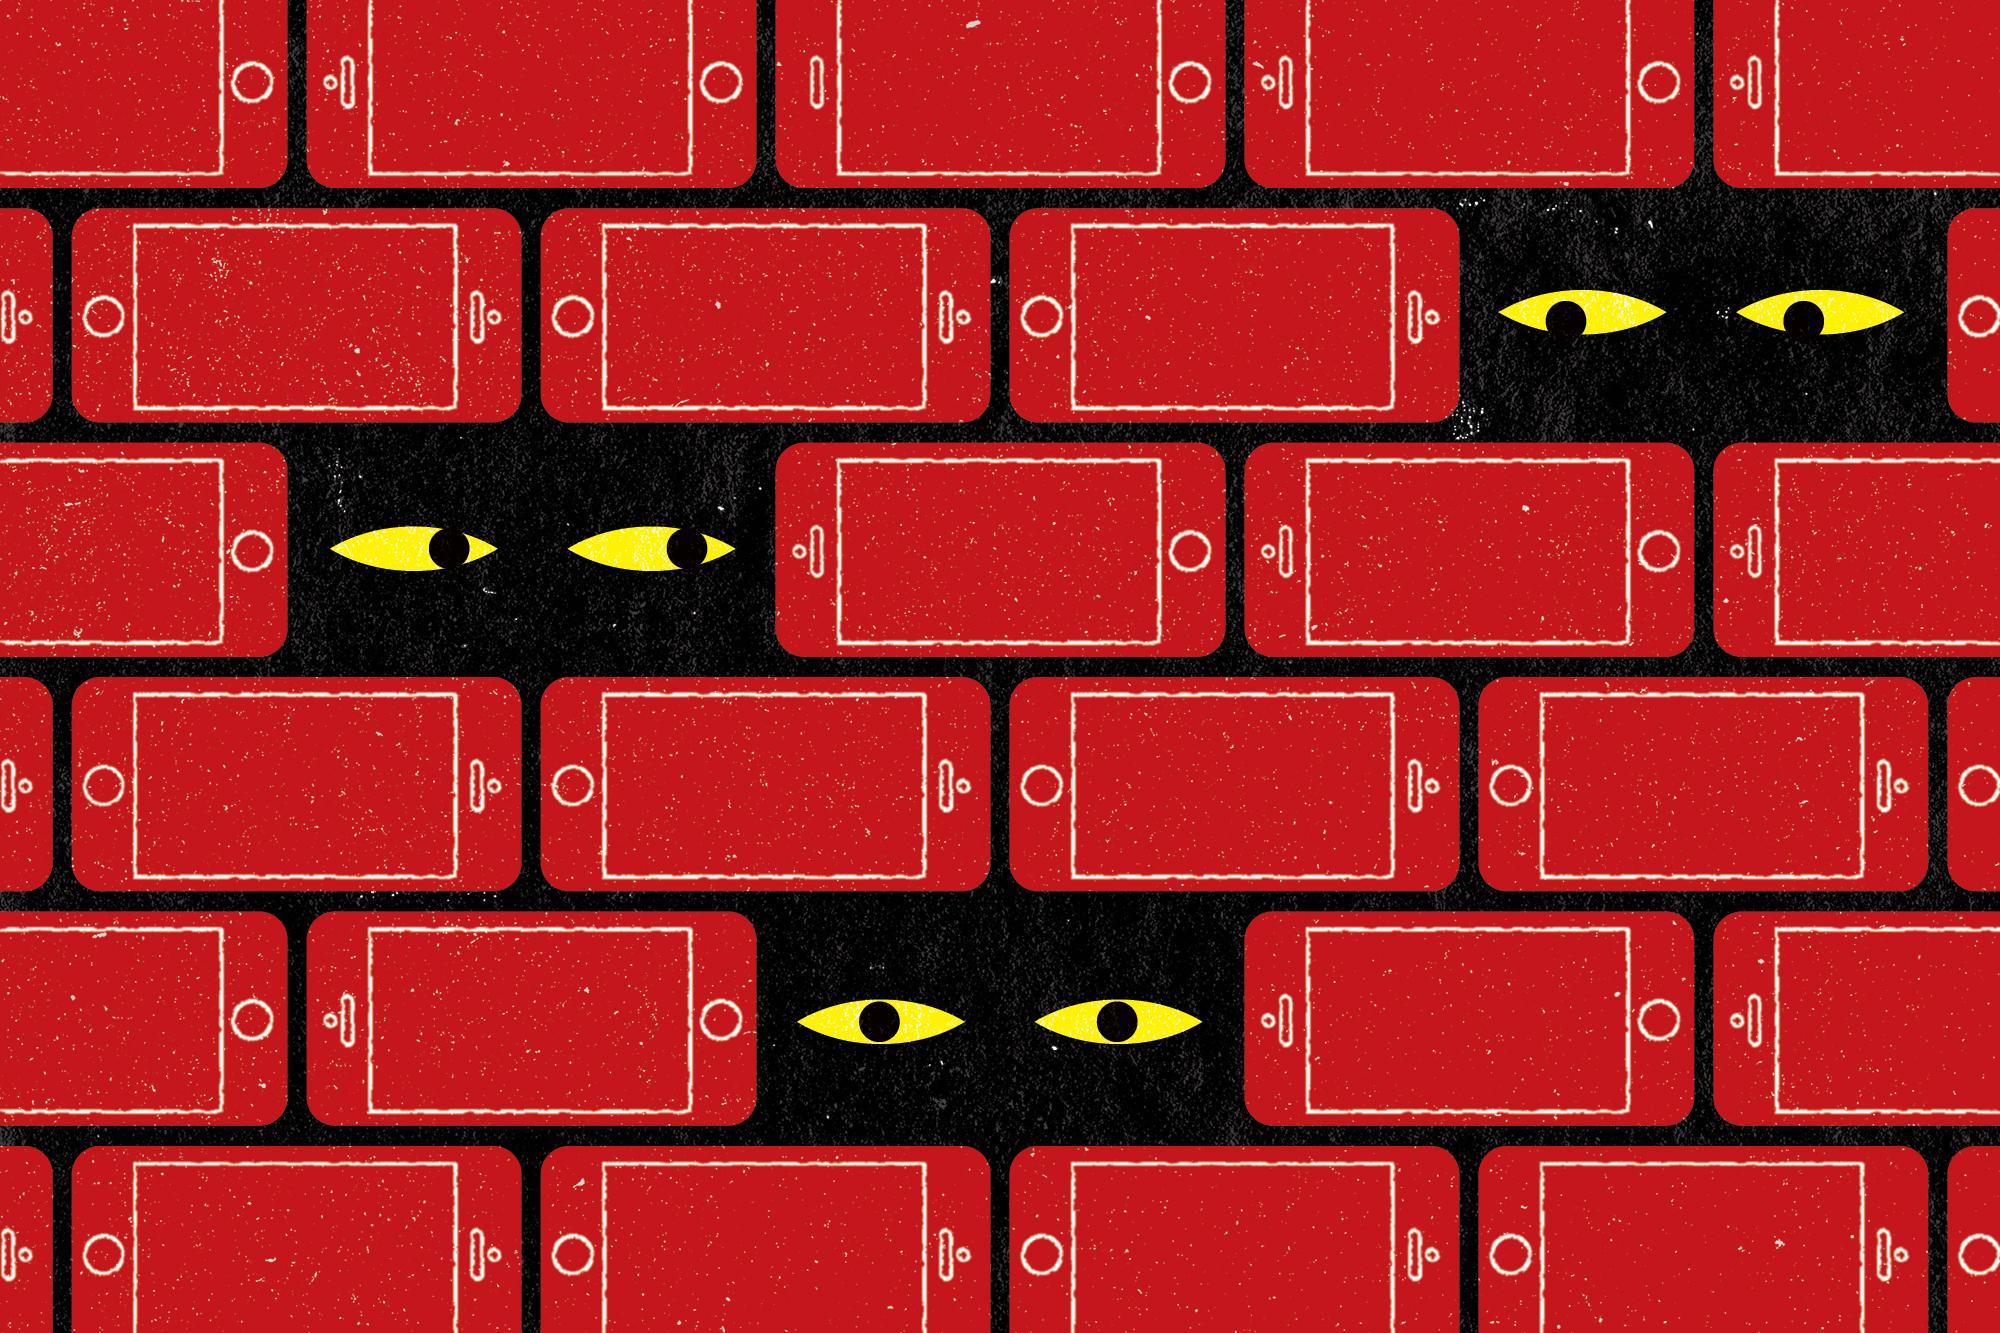 Celebrity Phone Hacking Scandal